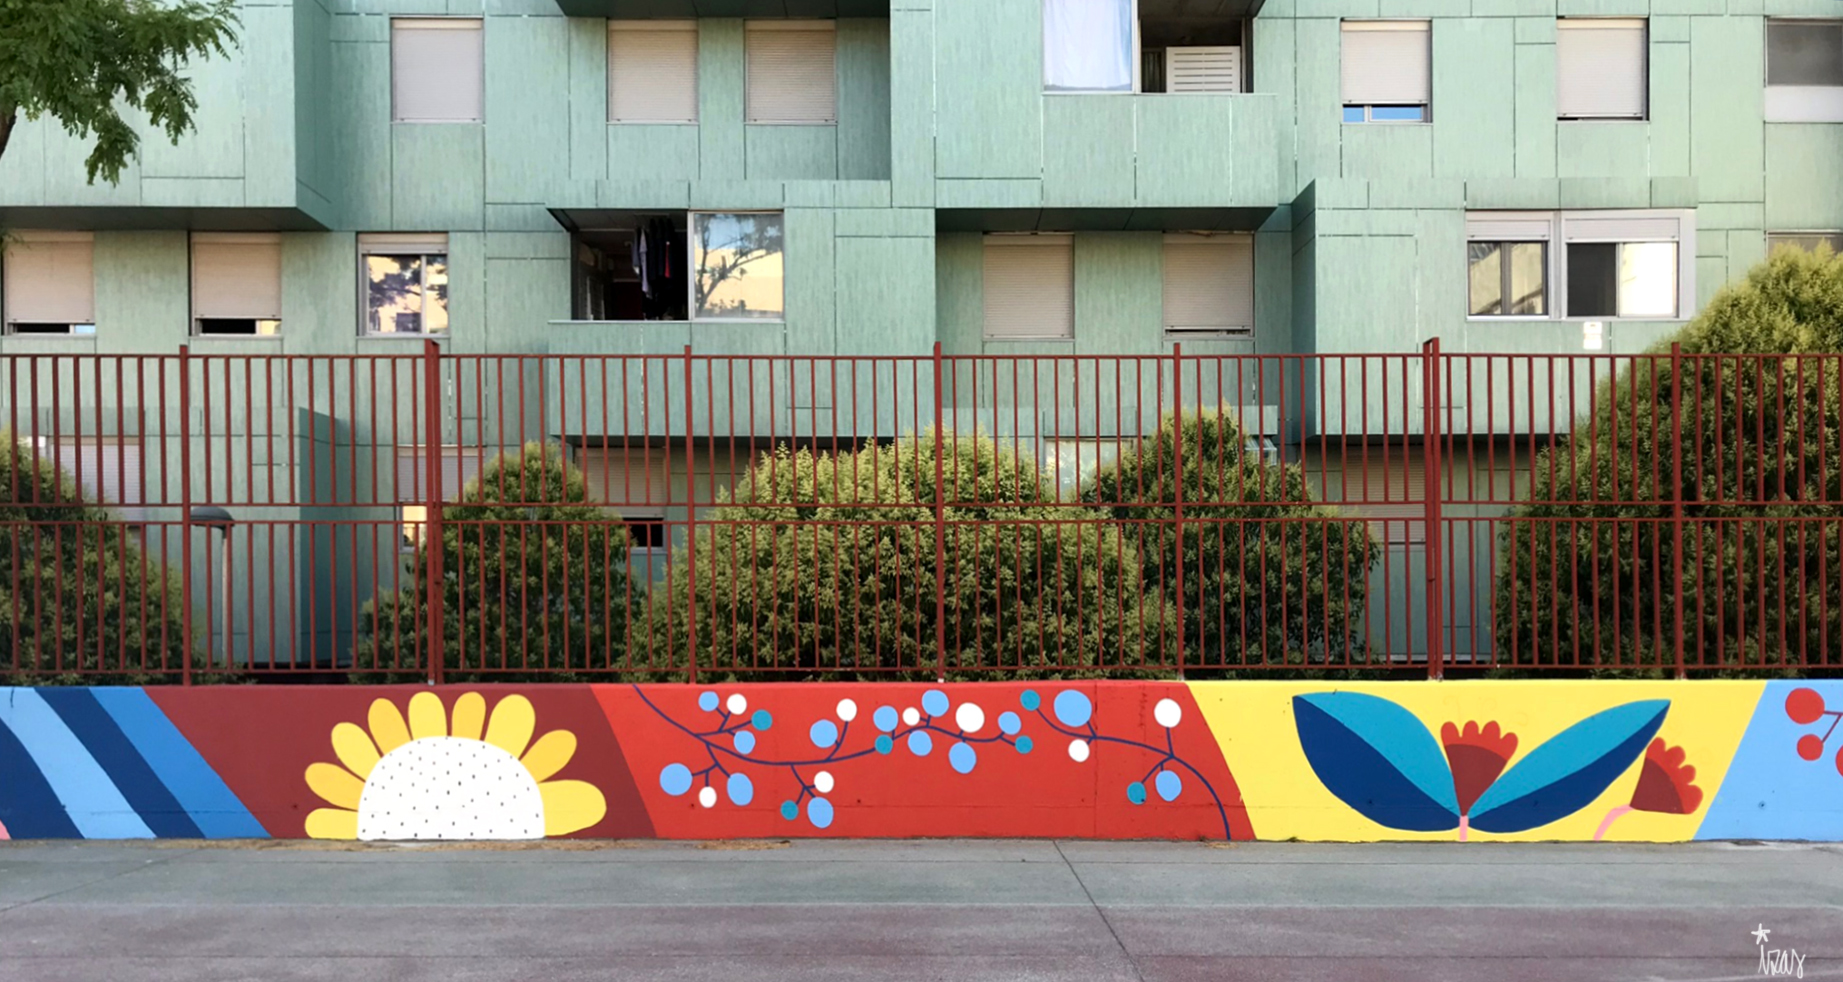 mural izas azulpatio ceip eduardo rojo patio detalle 10